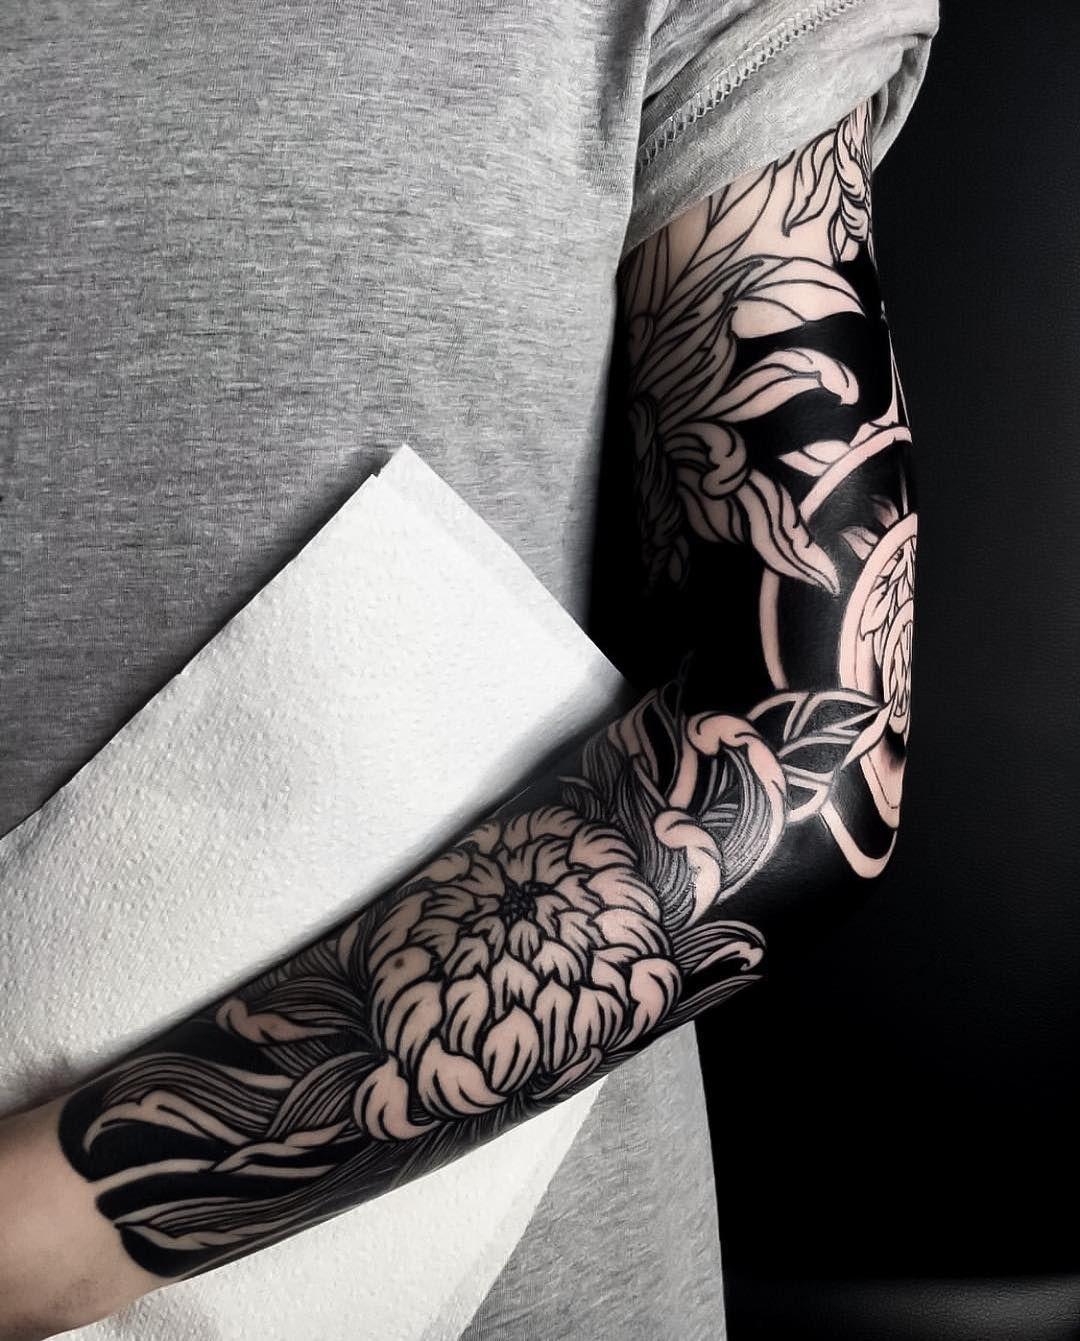 Japanese Ink On Instagram Japanese Inspired Blackwork Tattoo Sleeve By Caljenx Japaneseink Japanesetattoo Irezum Blackwork Tattoo Sleeve Tattoos Tattoos